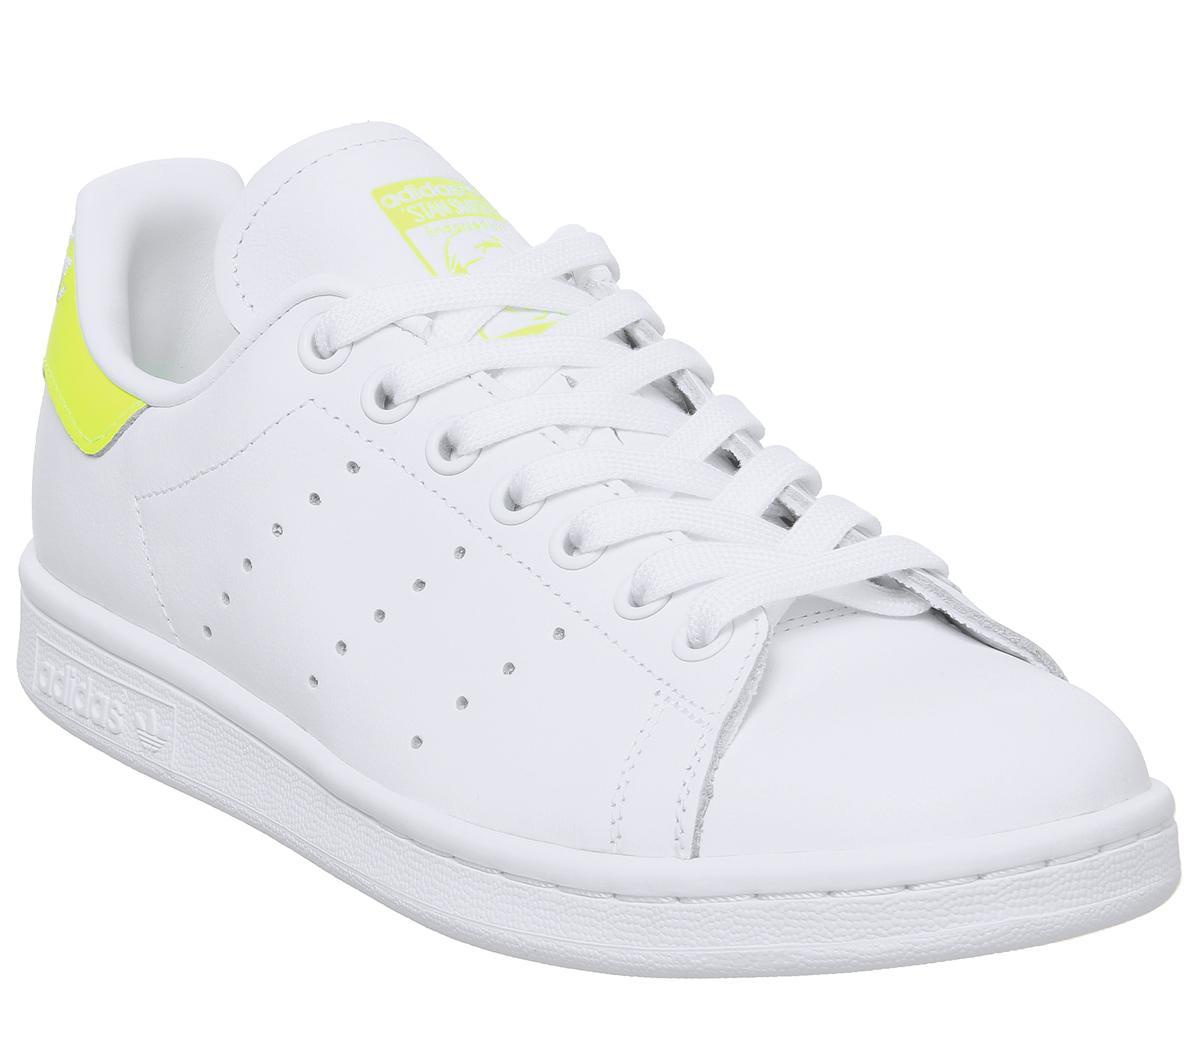 adidas Stan Smith Trainers White Solar